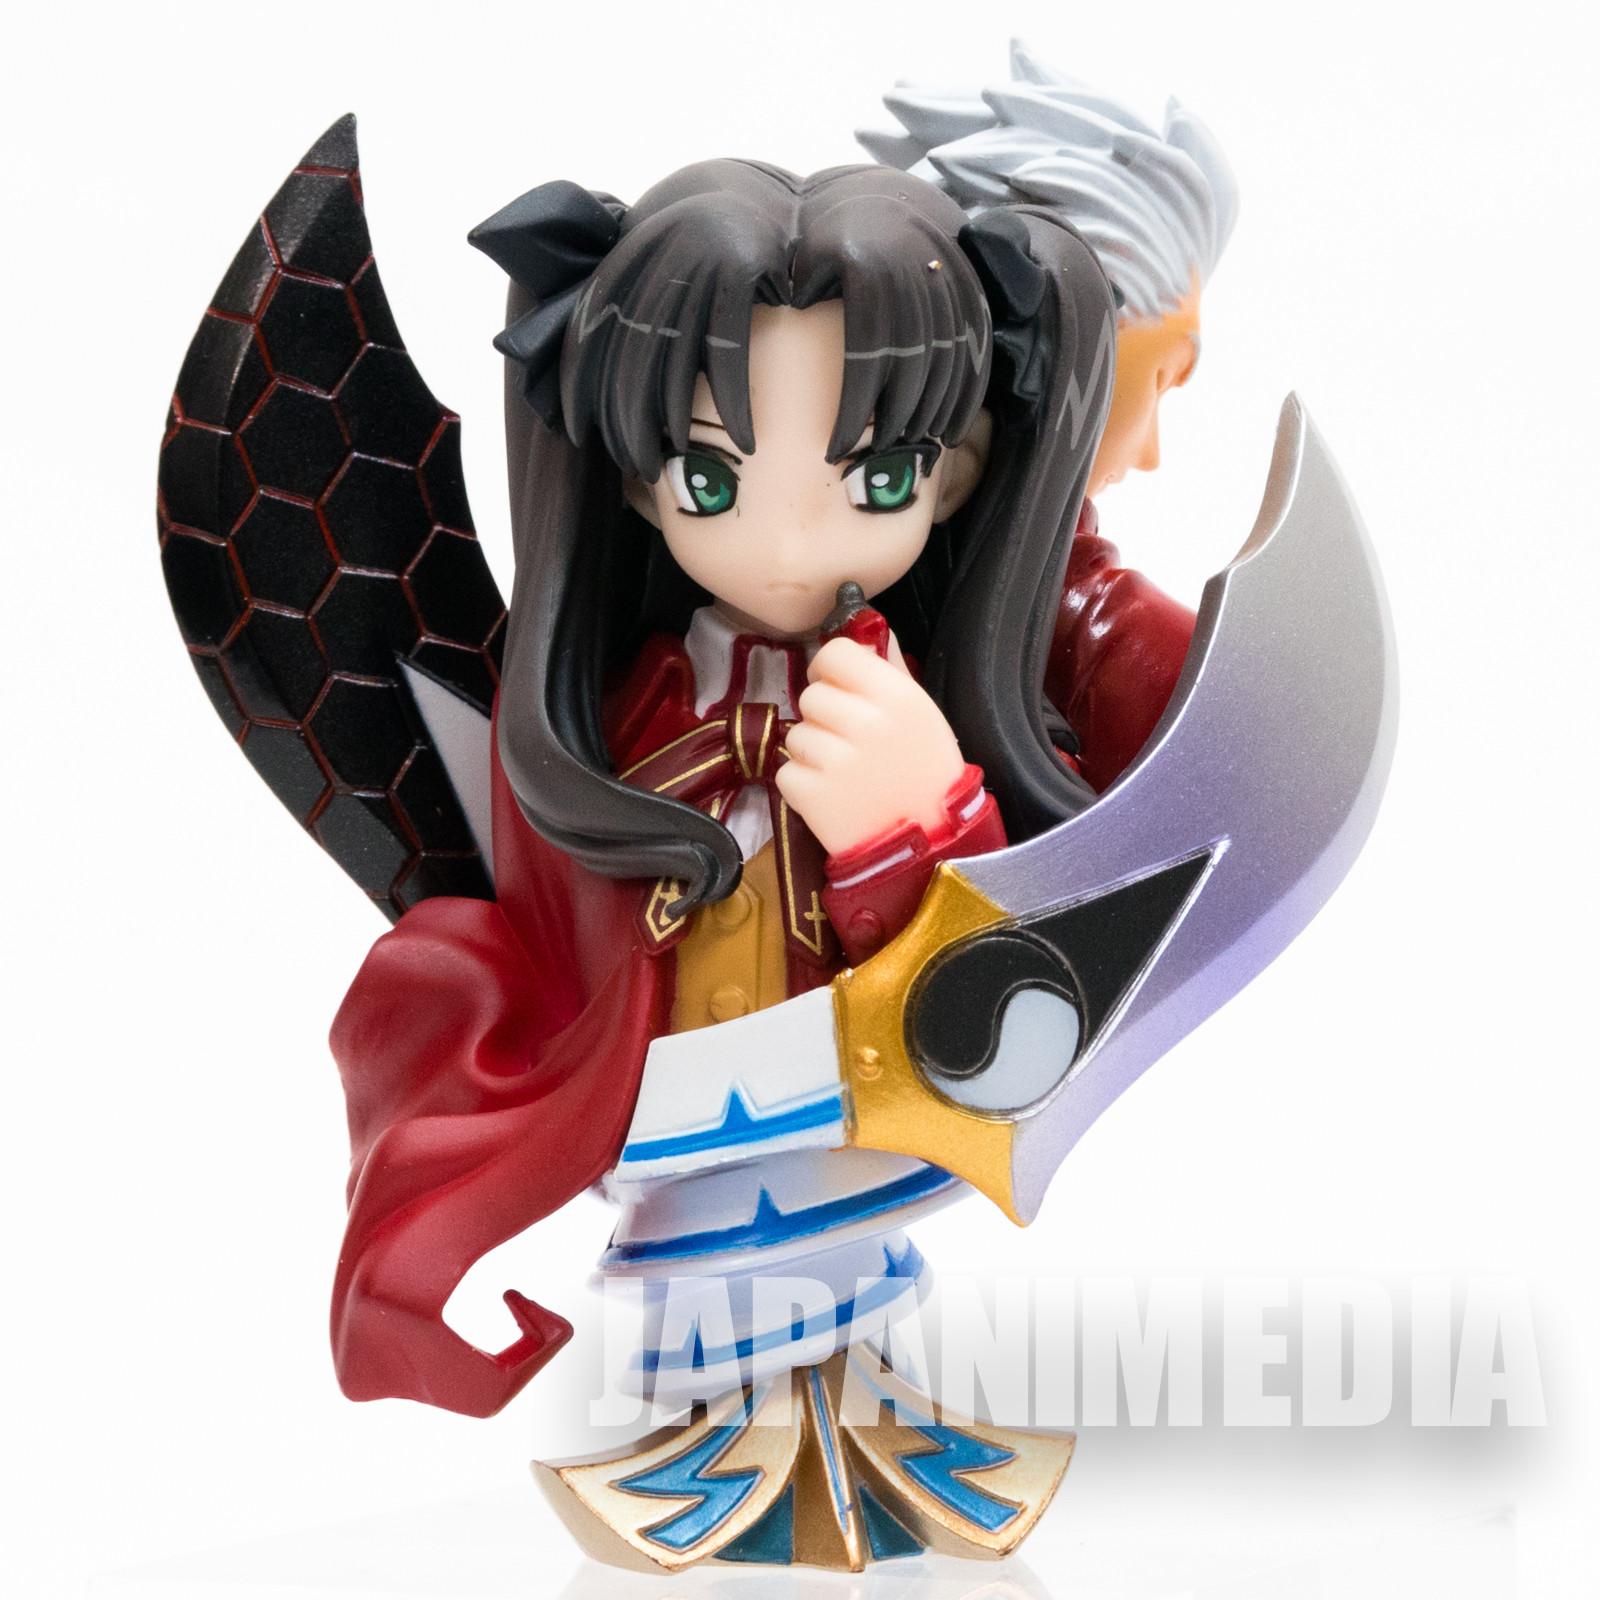 Fate/Stay Night Rin Tohsaka Archer Bust Figure JAPAN ANIME MANGA